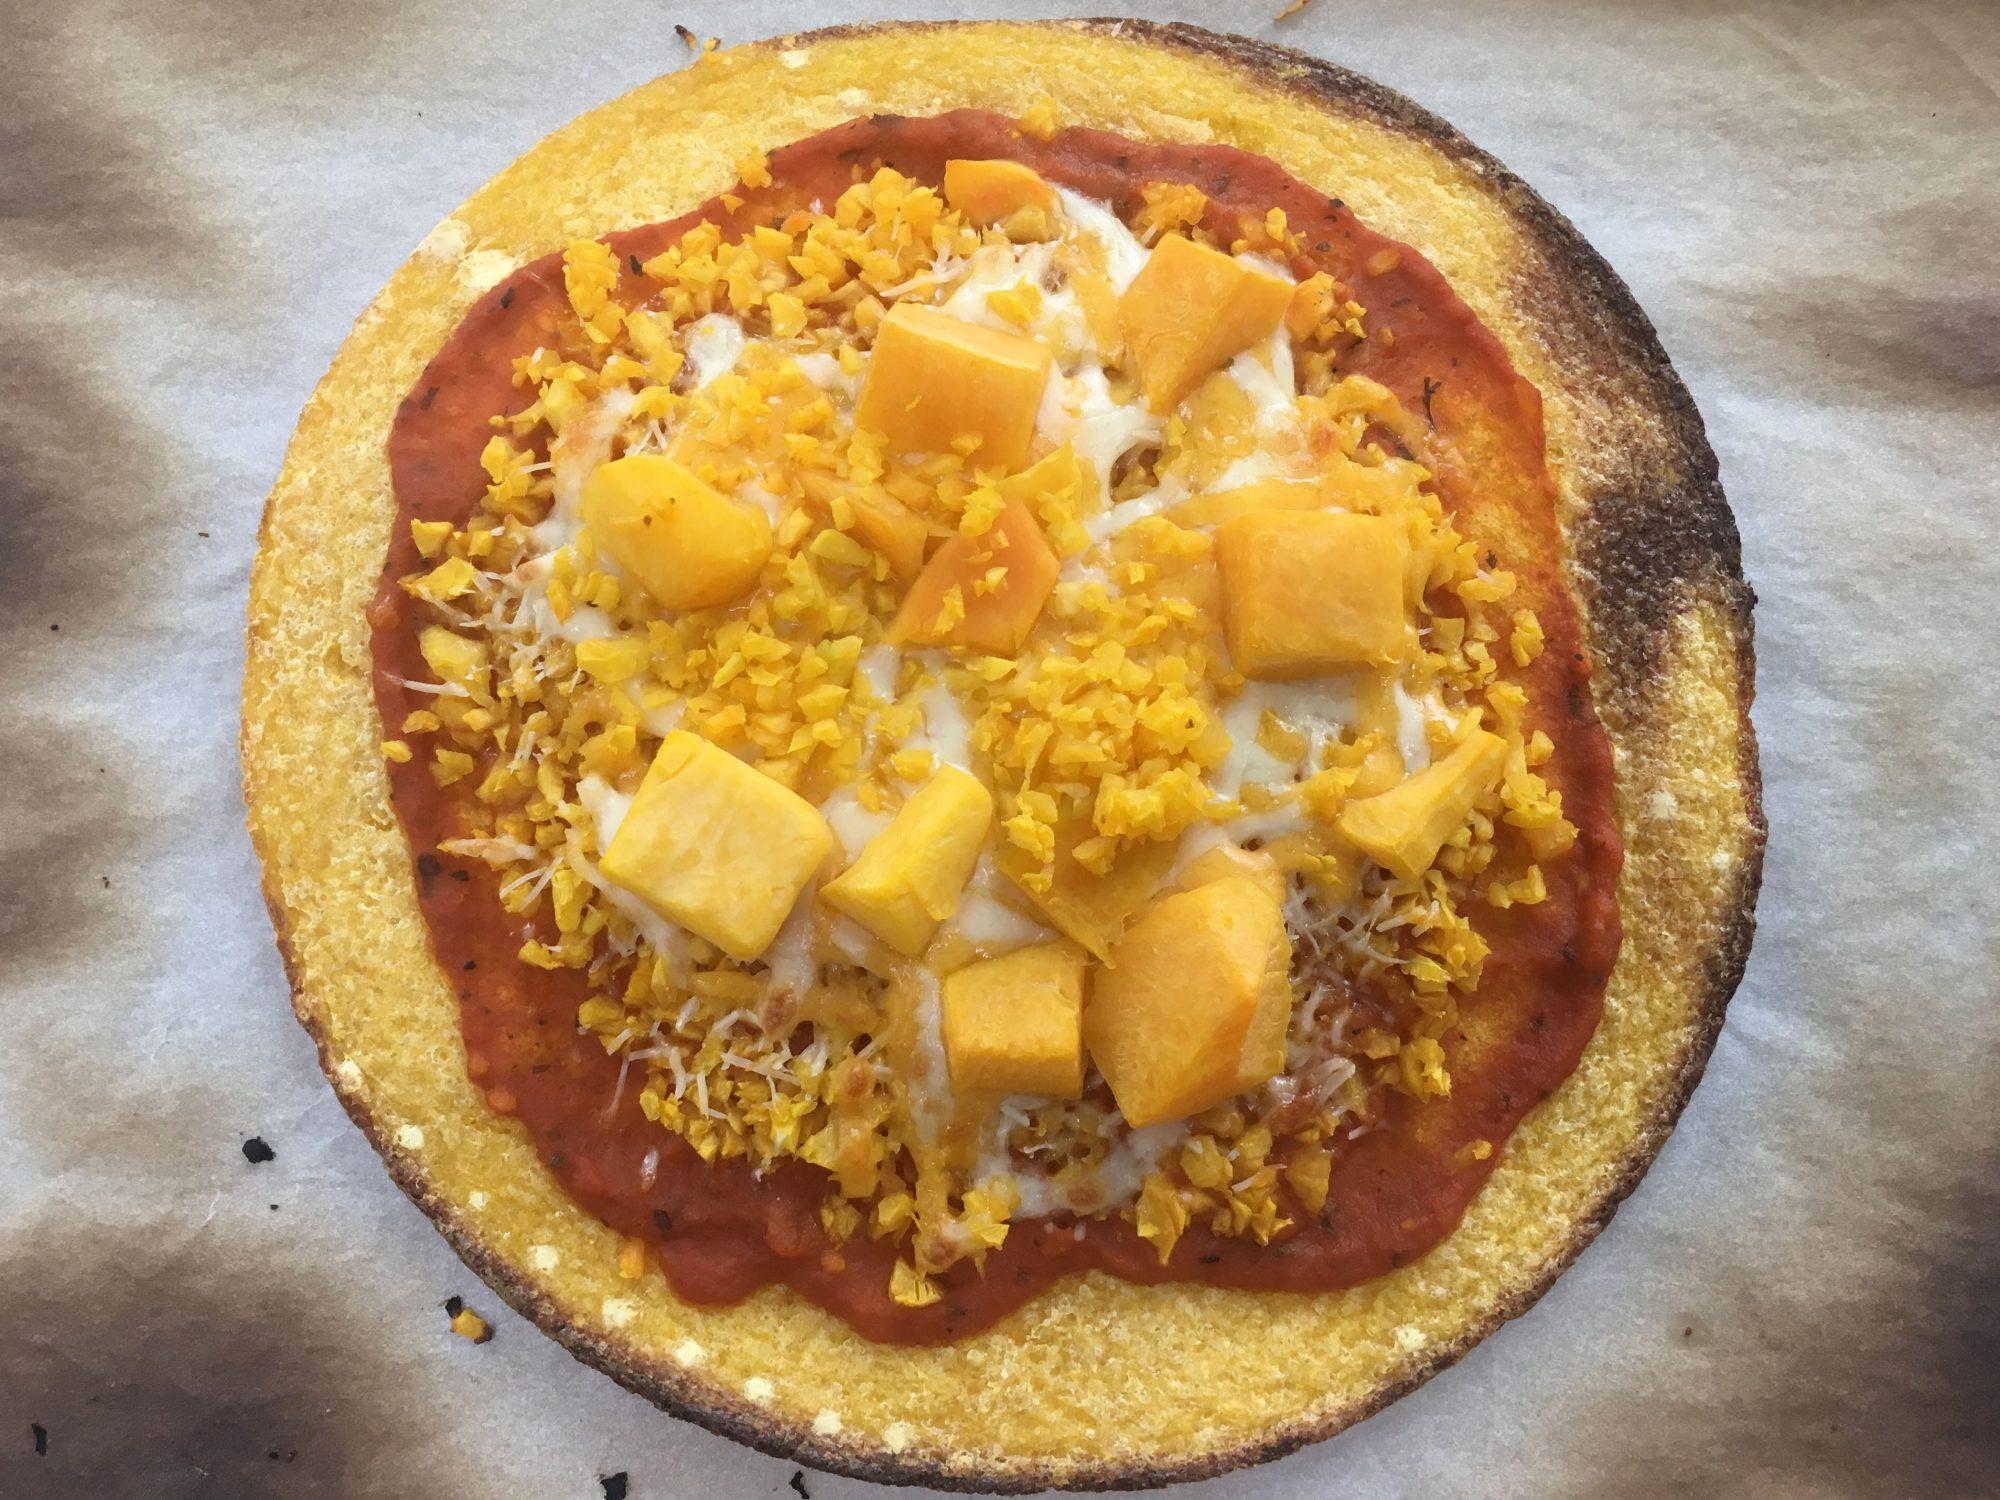 Trader Joe's Butternut Squash Pizza Crust Baked